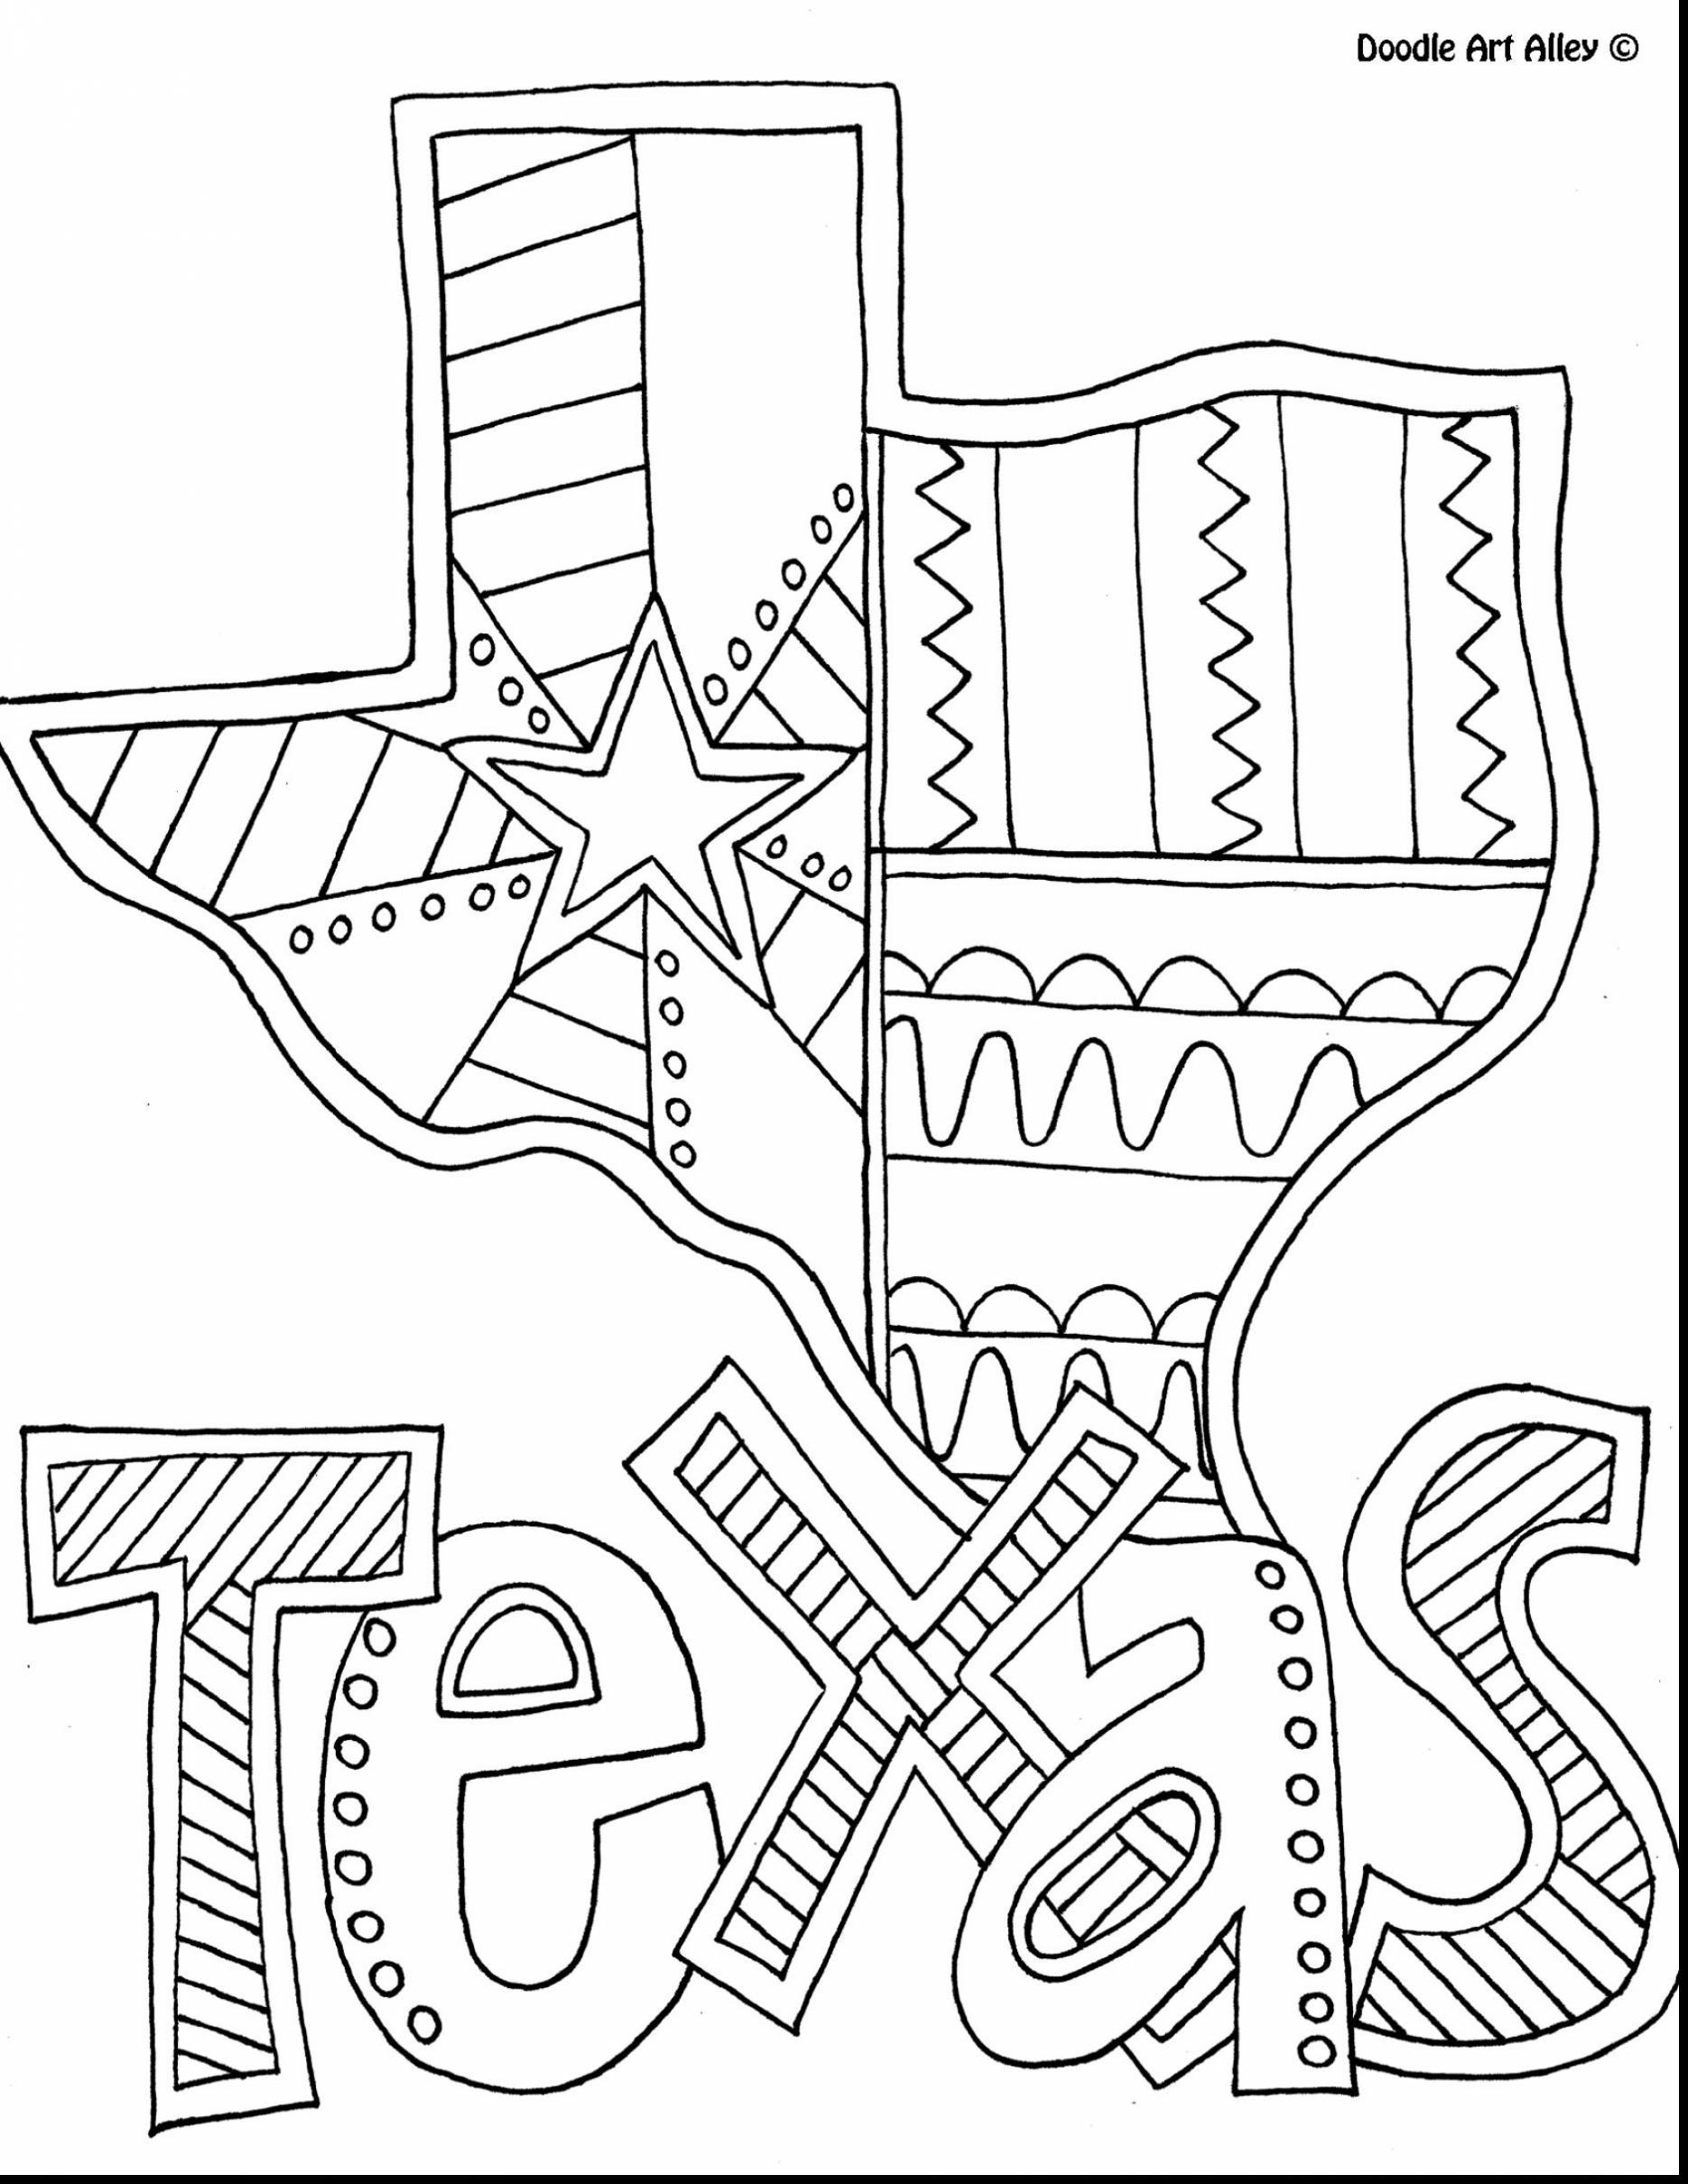 Steer Coloring Pages At Getdrawings